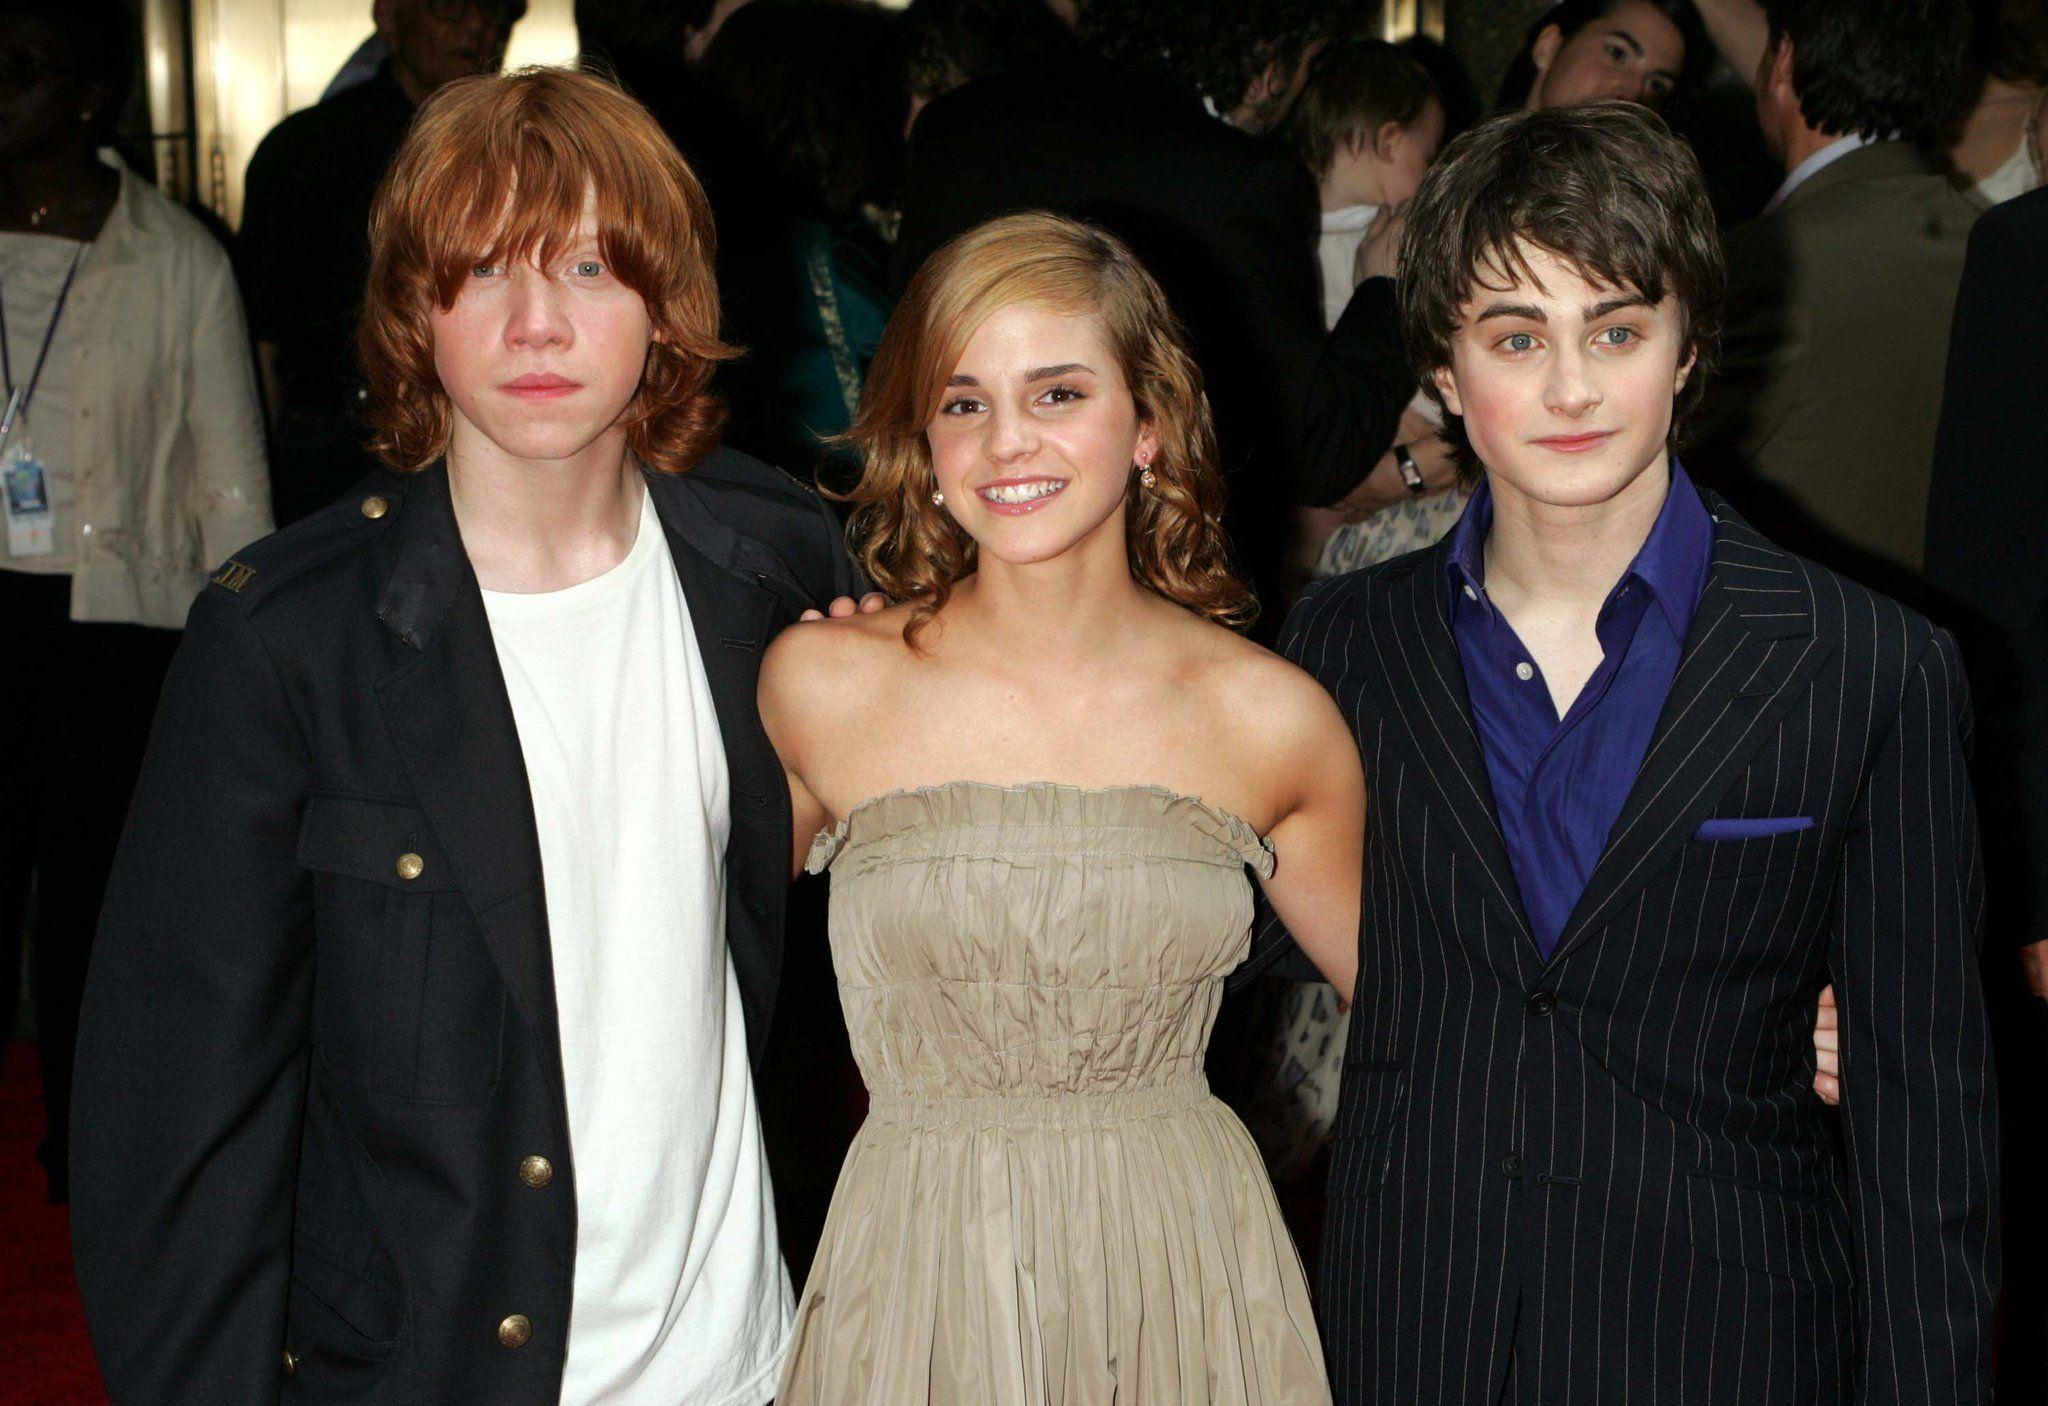 Harry Potter And The Prisoner Of Azkaban Premiere 2004 Emma Watson Harry Potter Daniel Radcliffe Harry Potter Harry Potter Voldemort